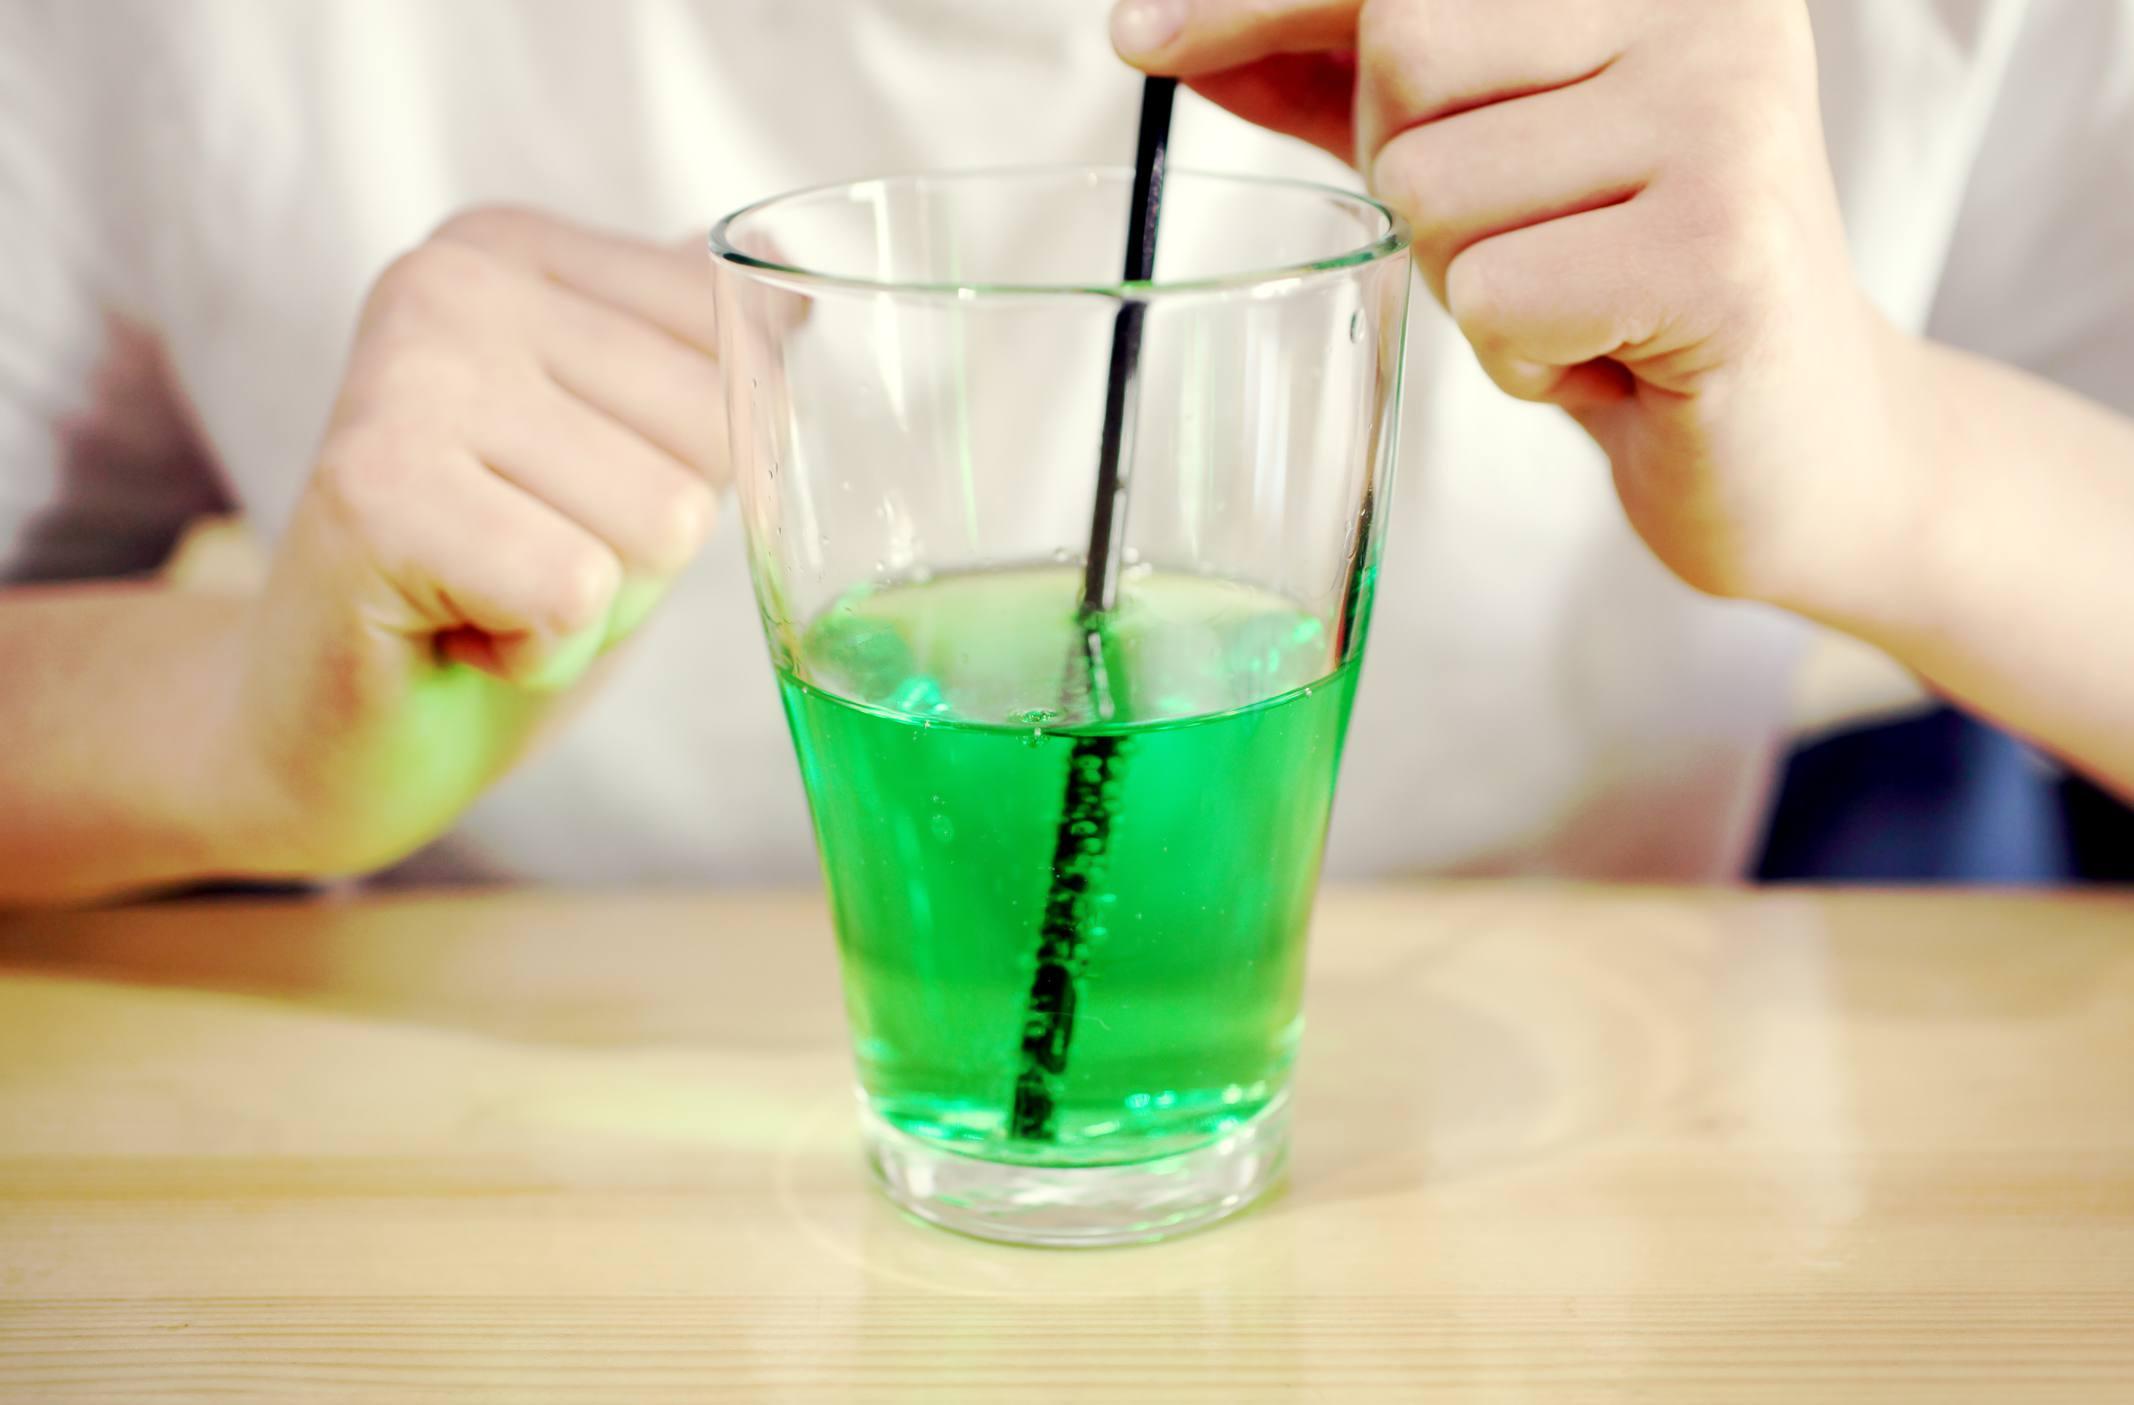 Glass of green soda